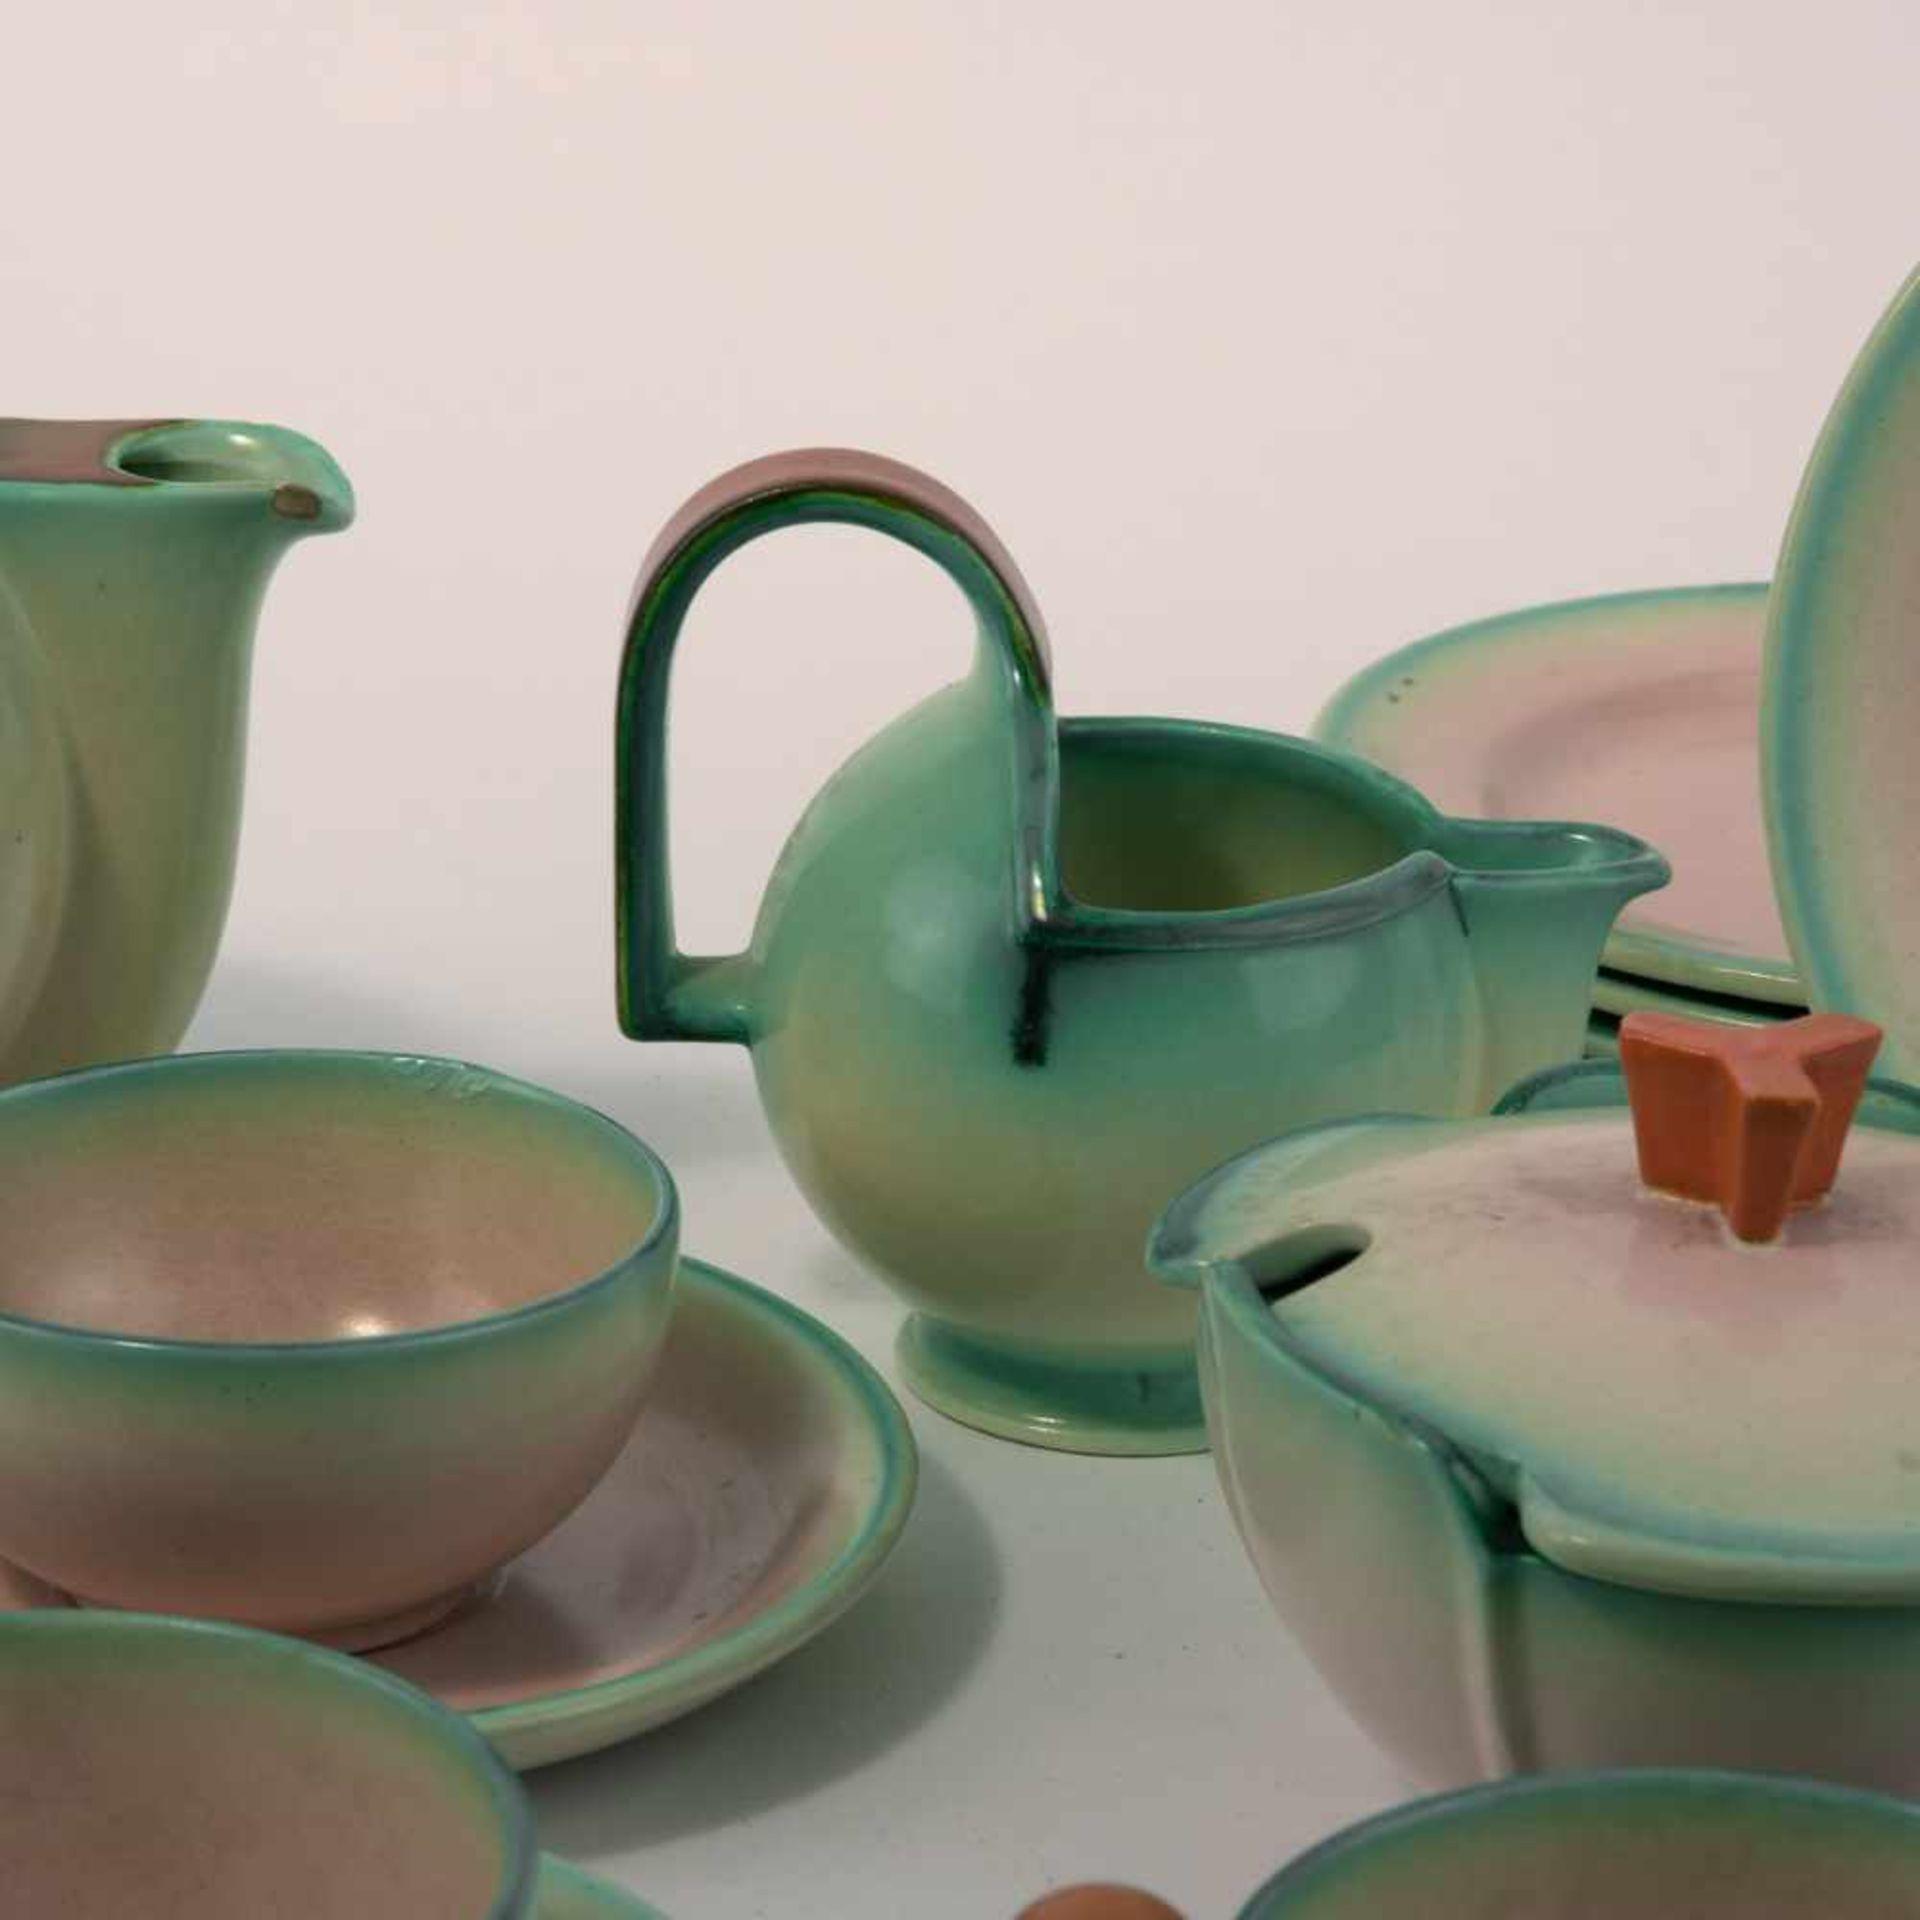 Los 25 - Eva Zeisel-Stricker Teeservice 'Fiuma', um 1928 15 Teile. Teekanne: H. 18 cm; Milchkanne: H. 12,2